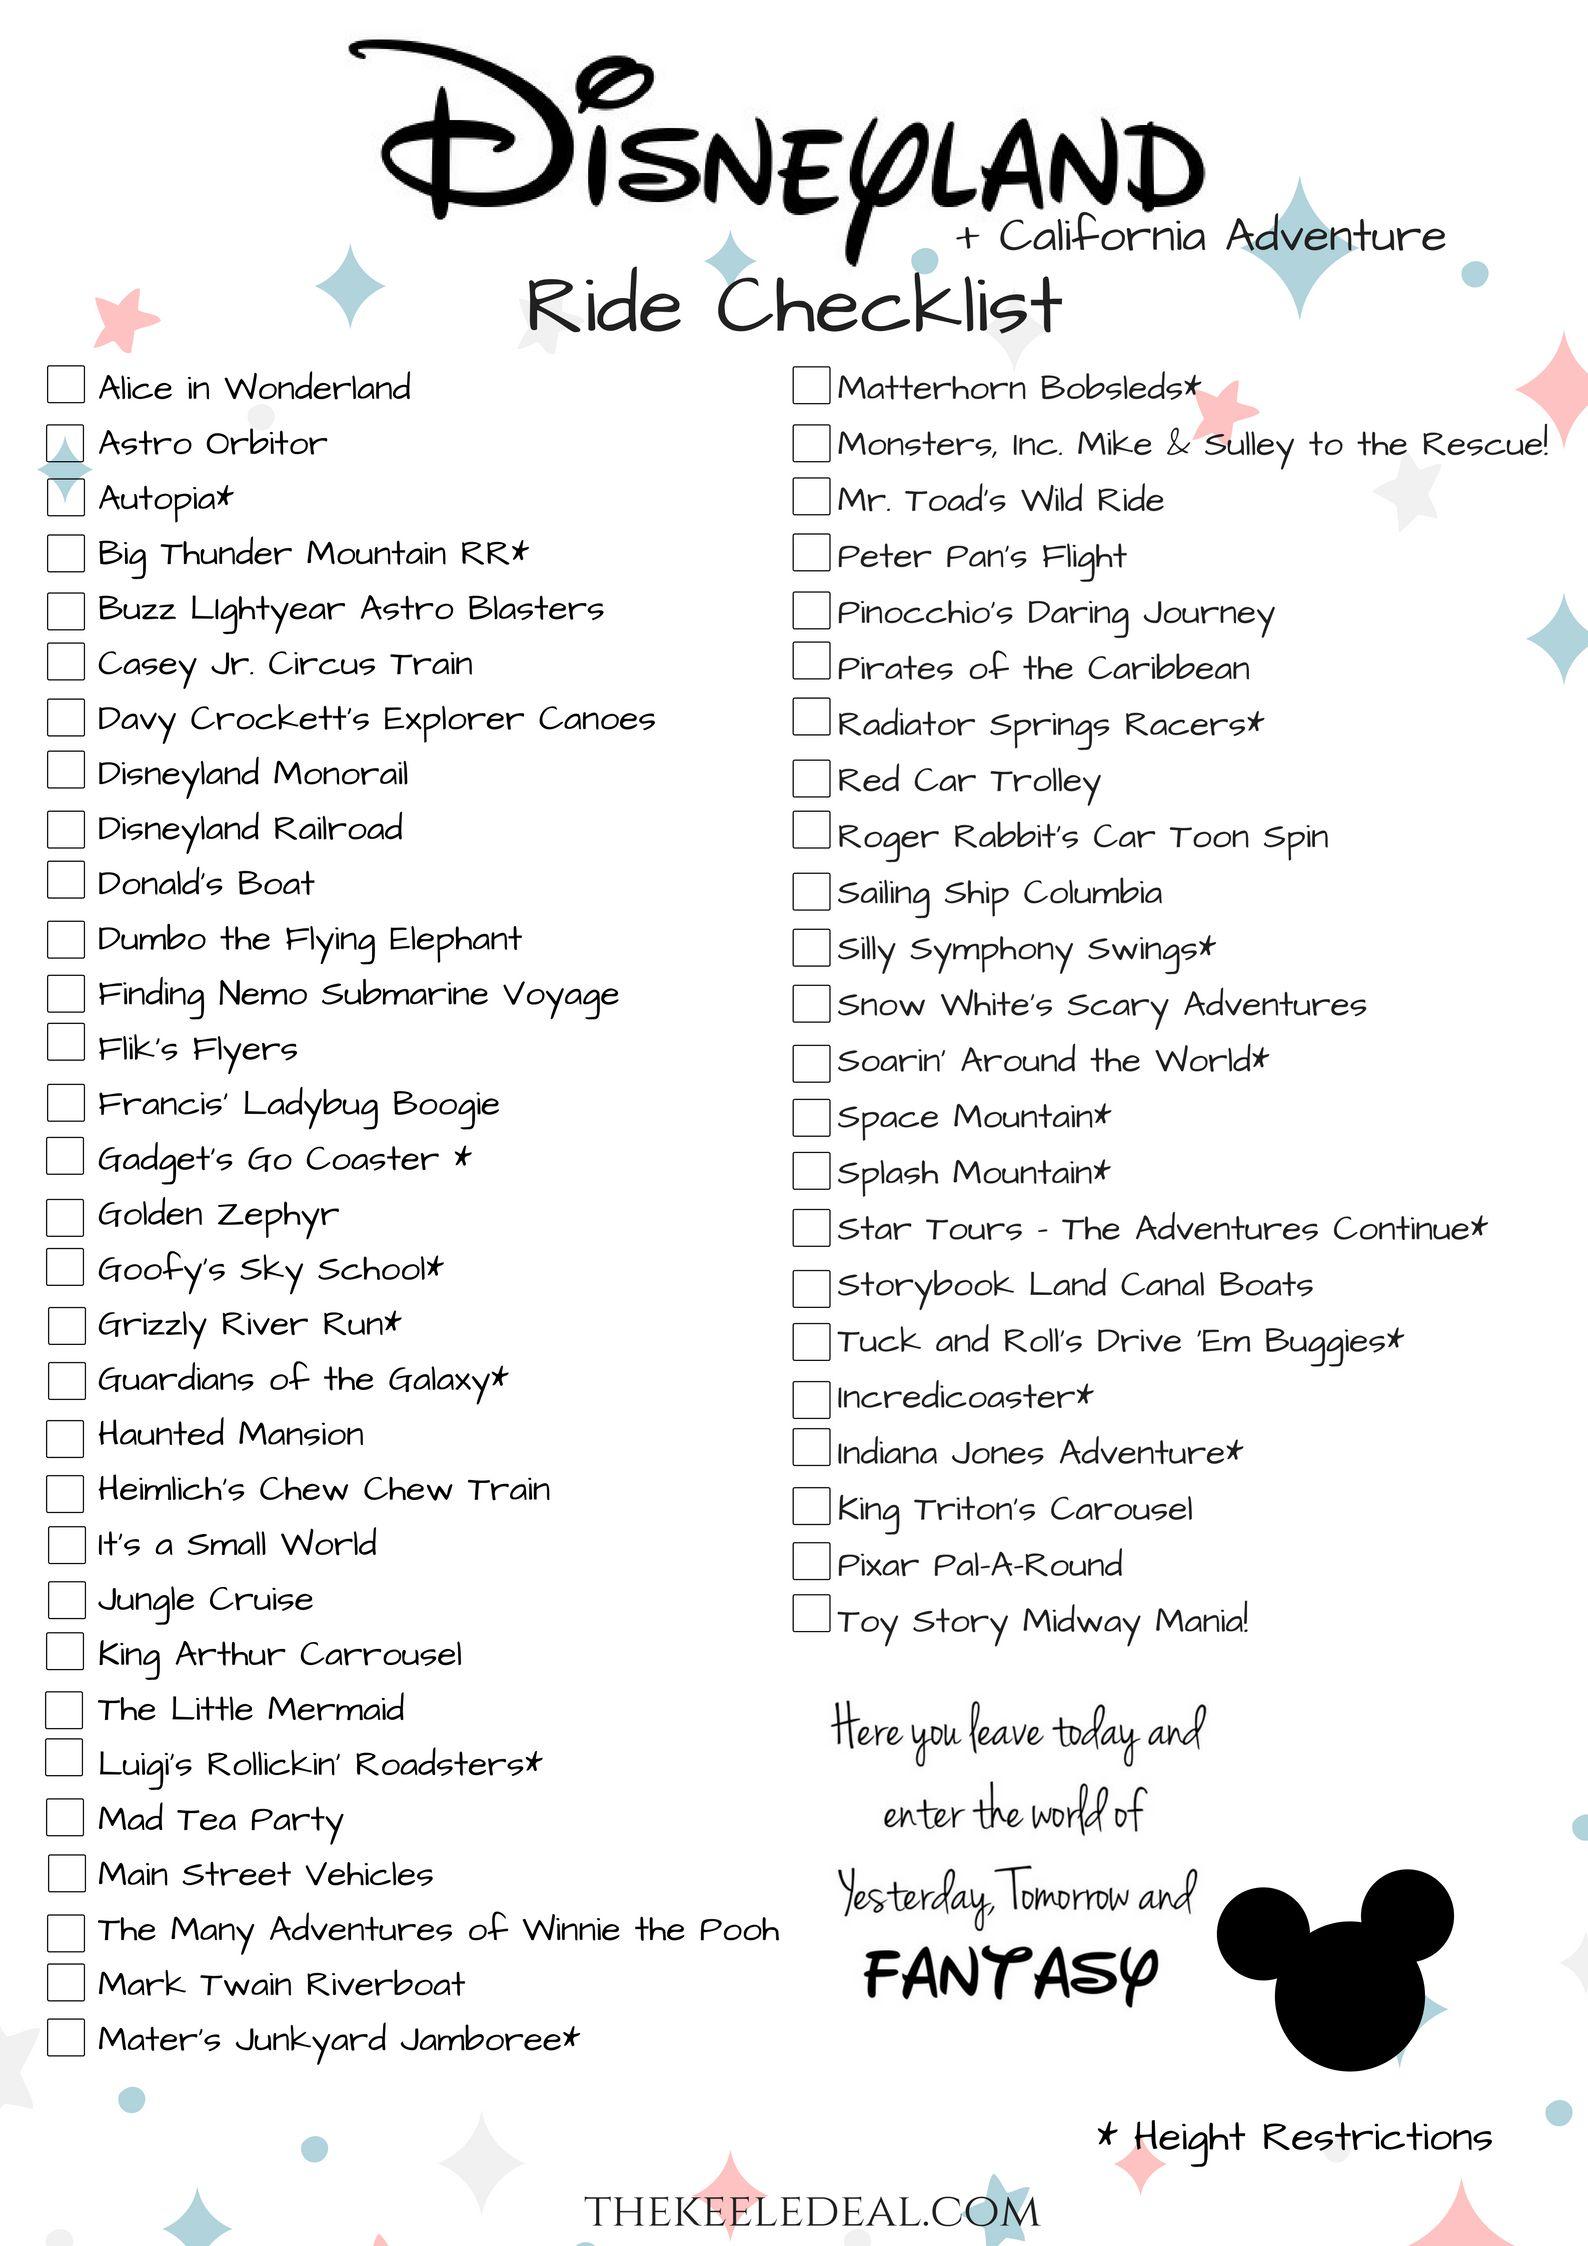 Disneyland Ride Checklist Free Printable